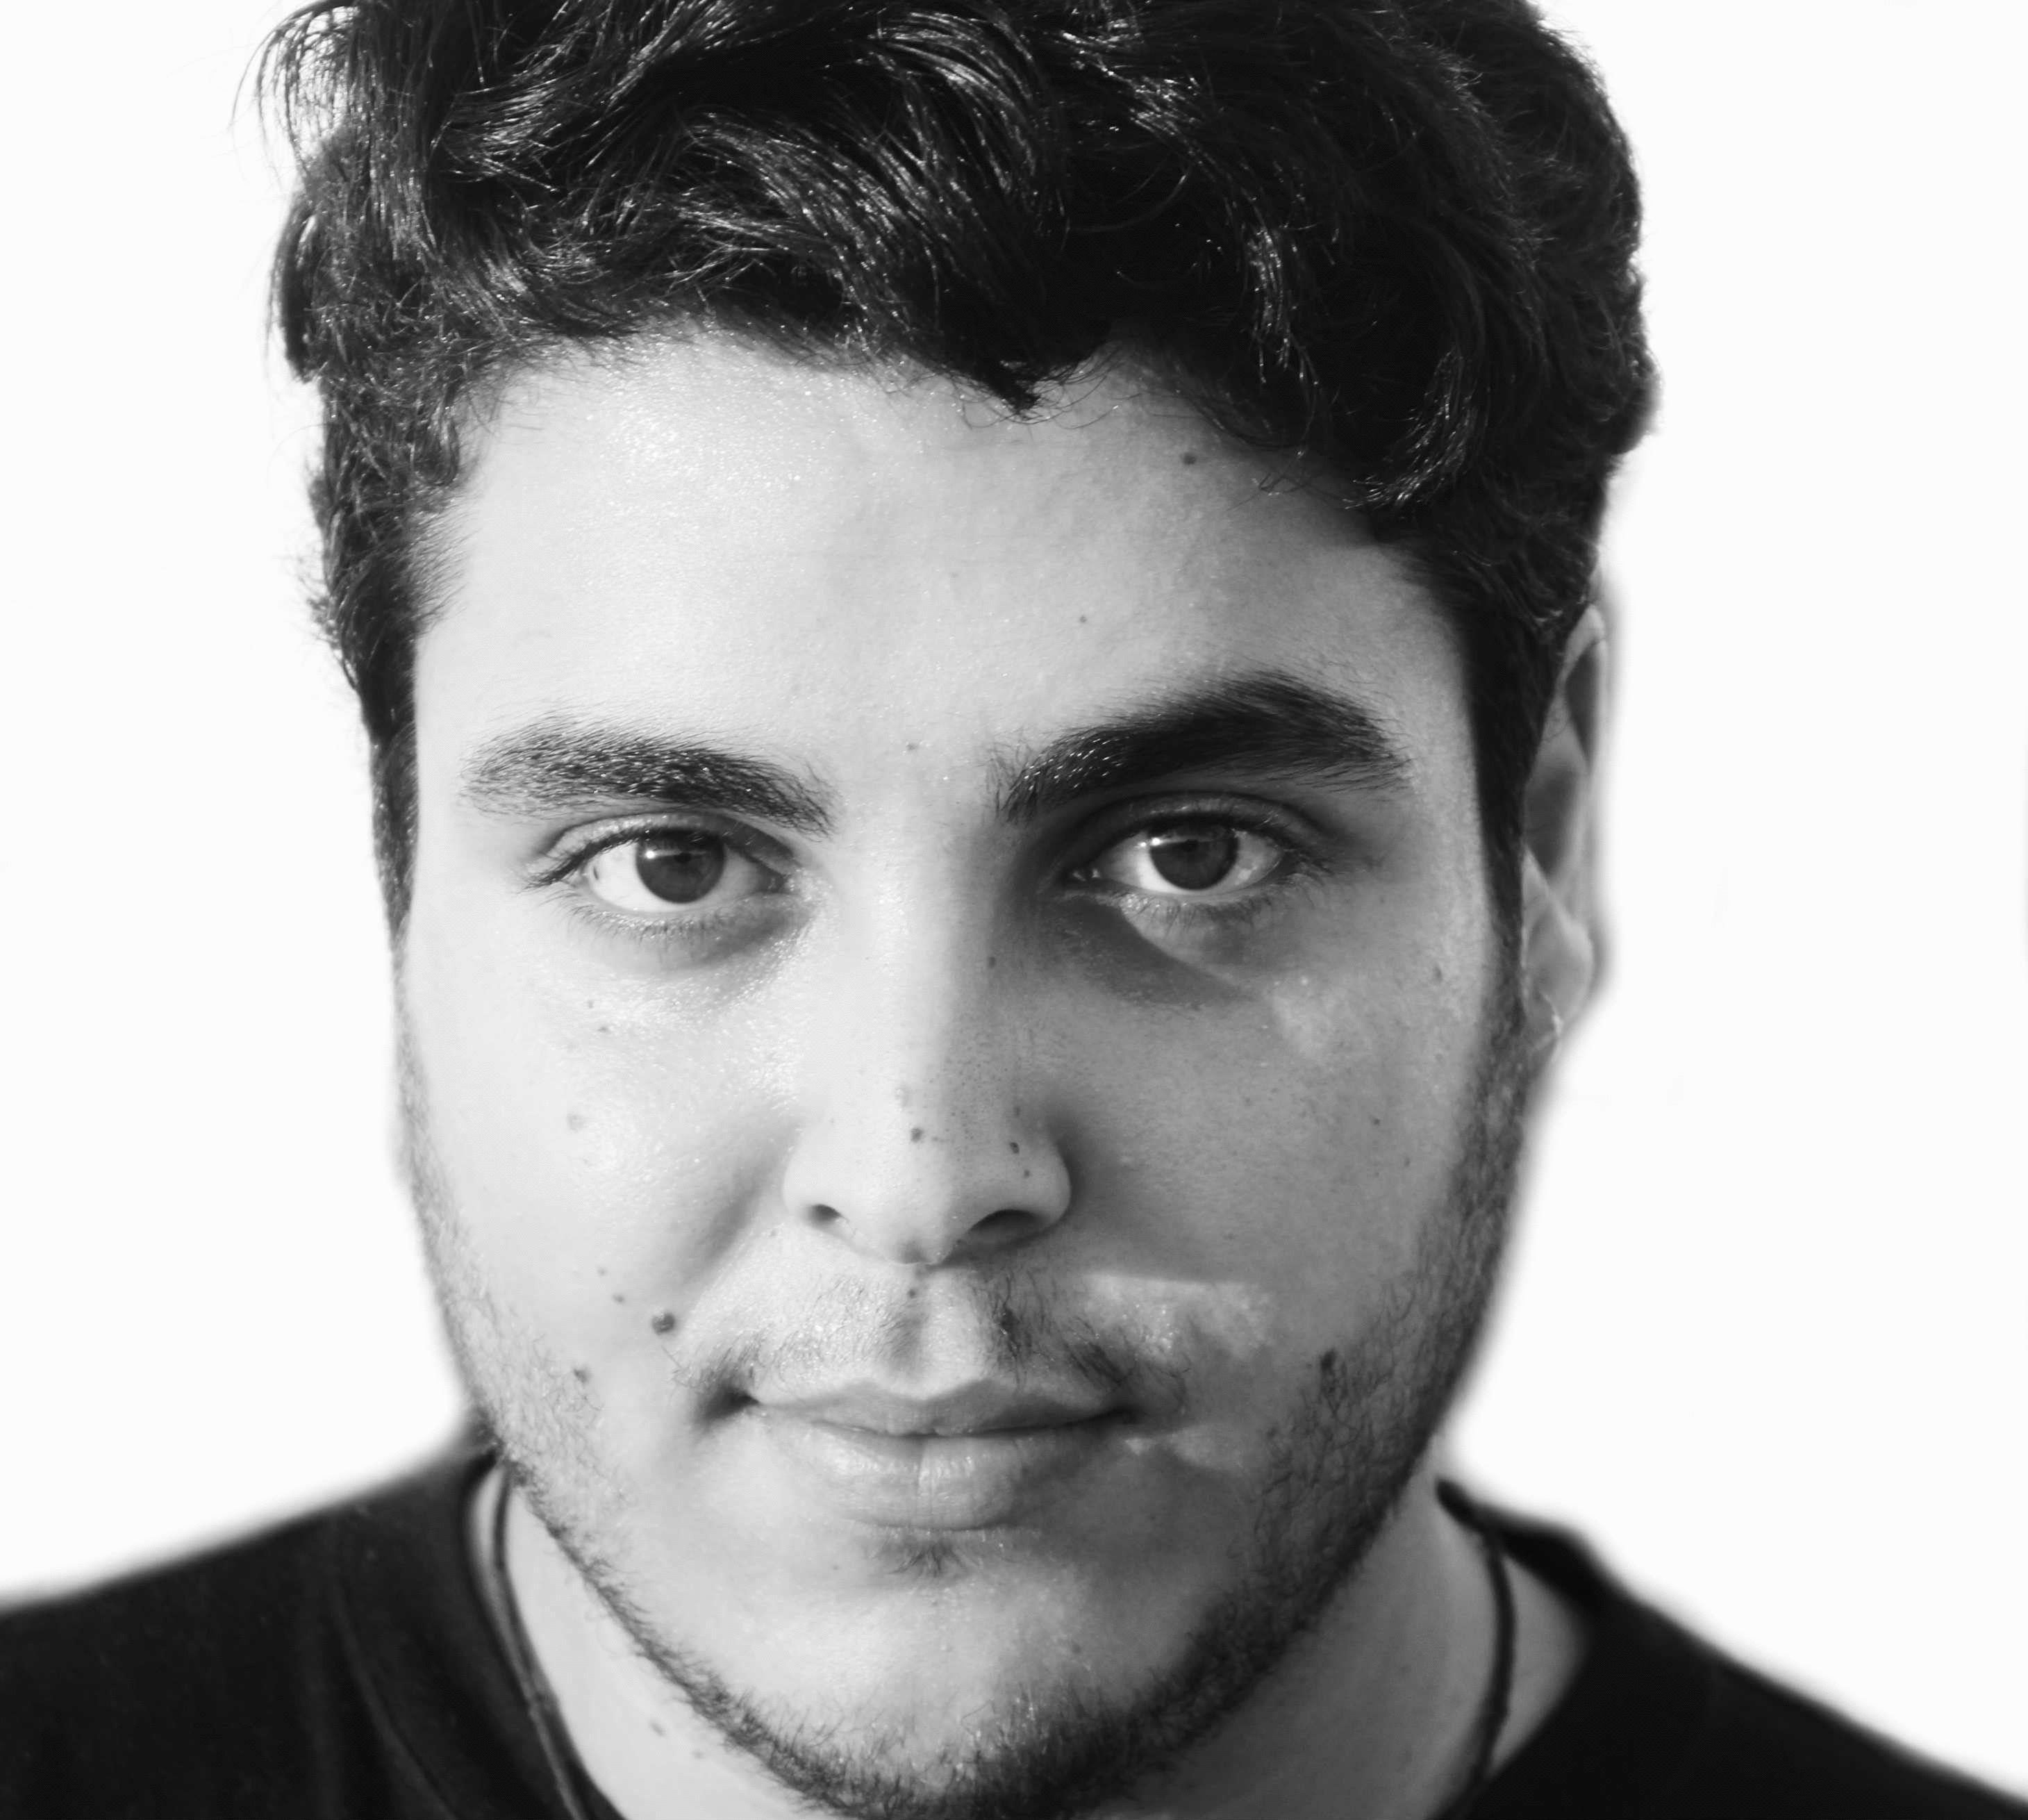 Seif Eddine Bejaoui